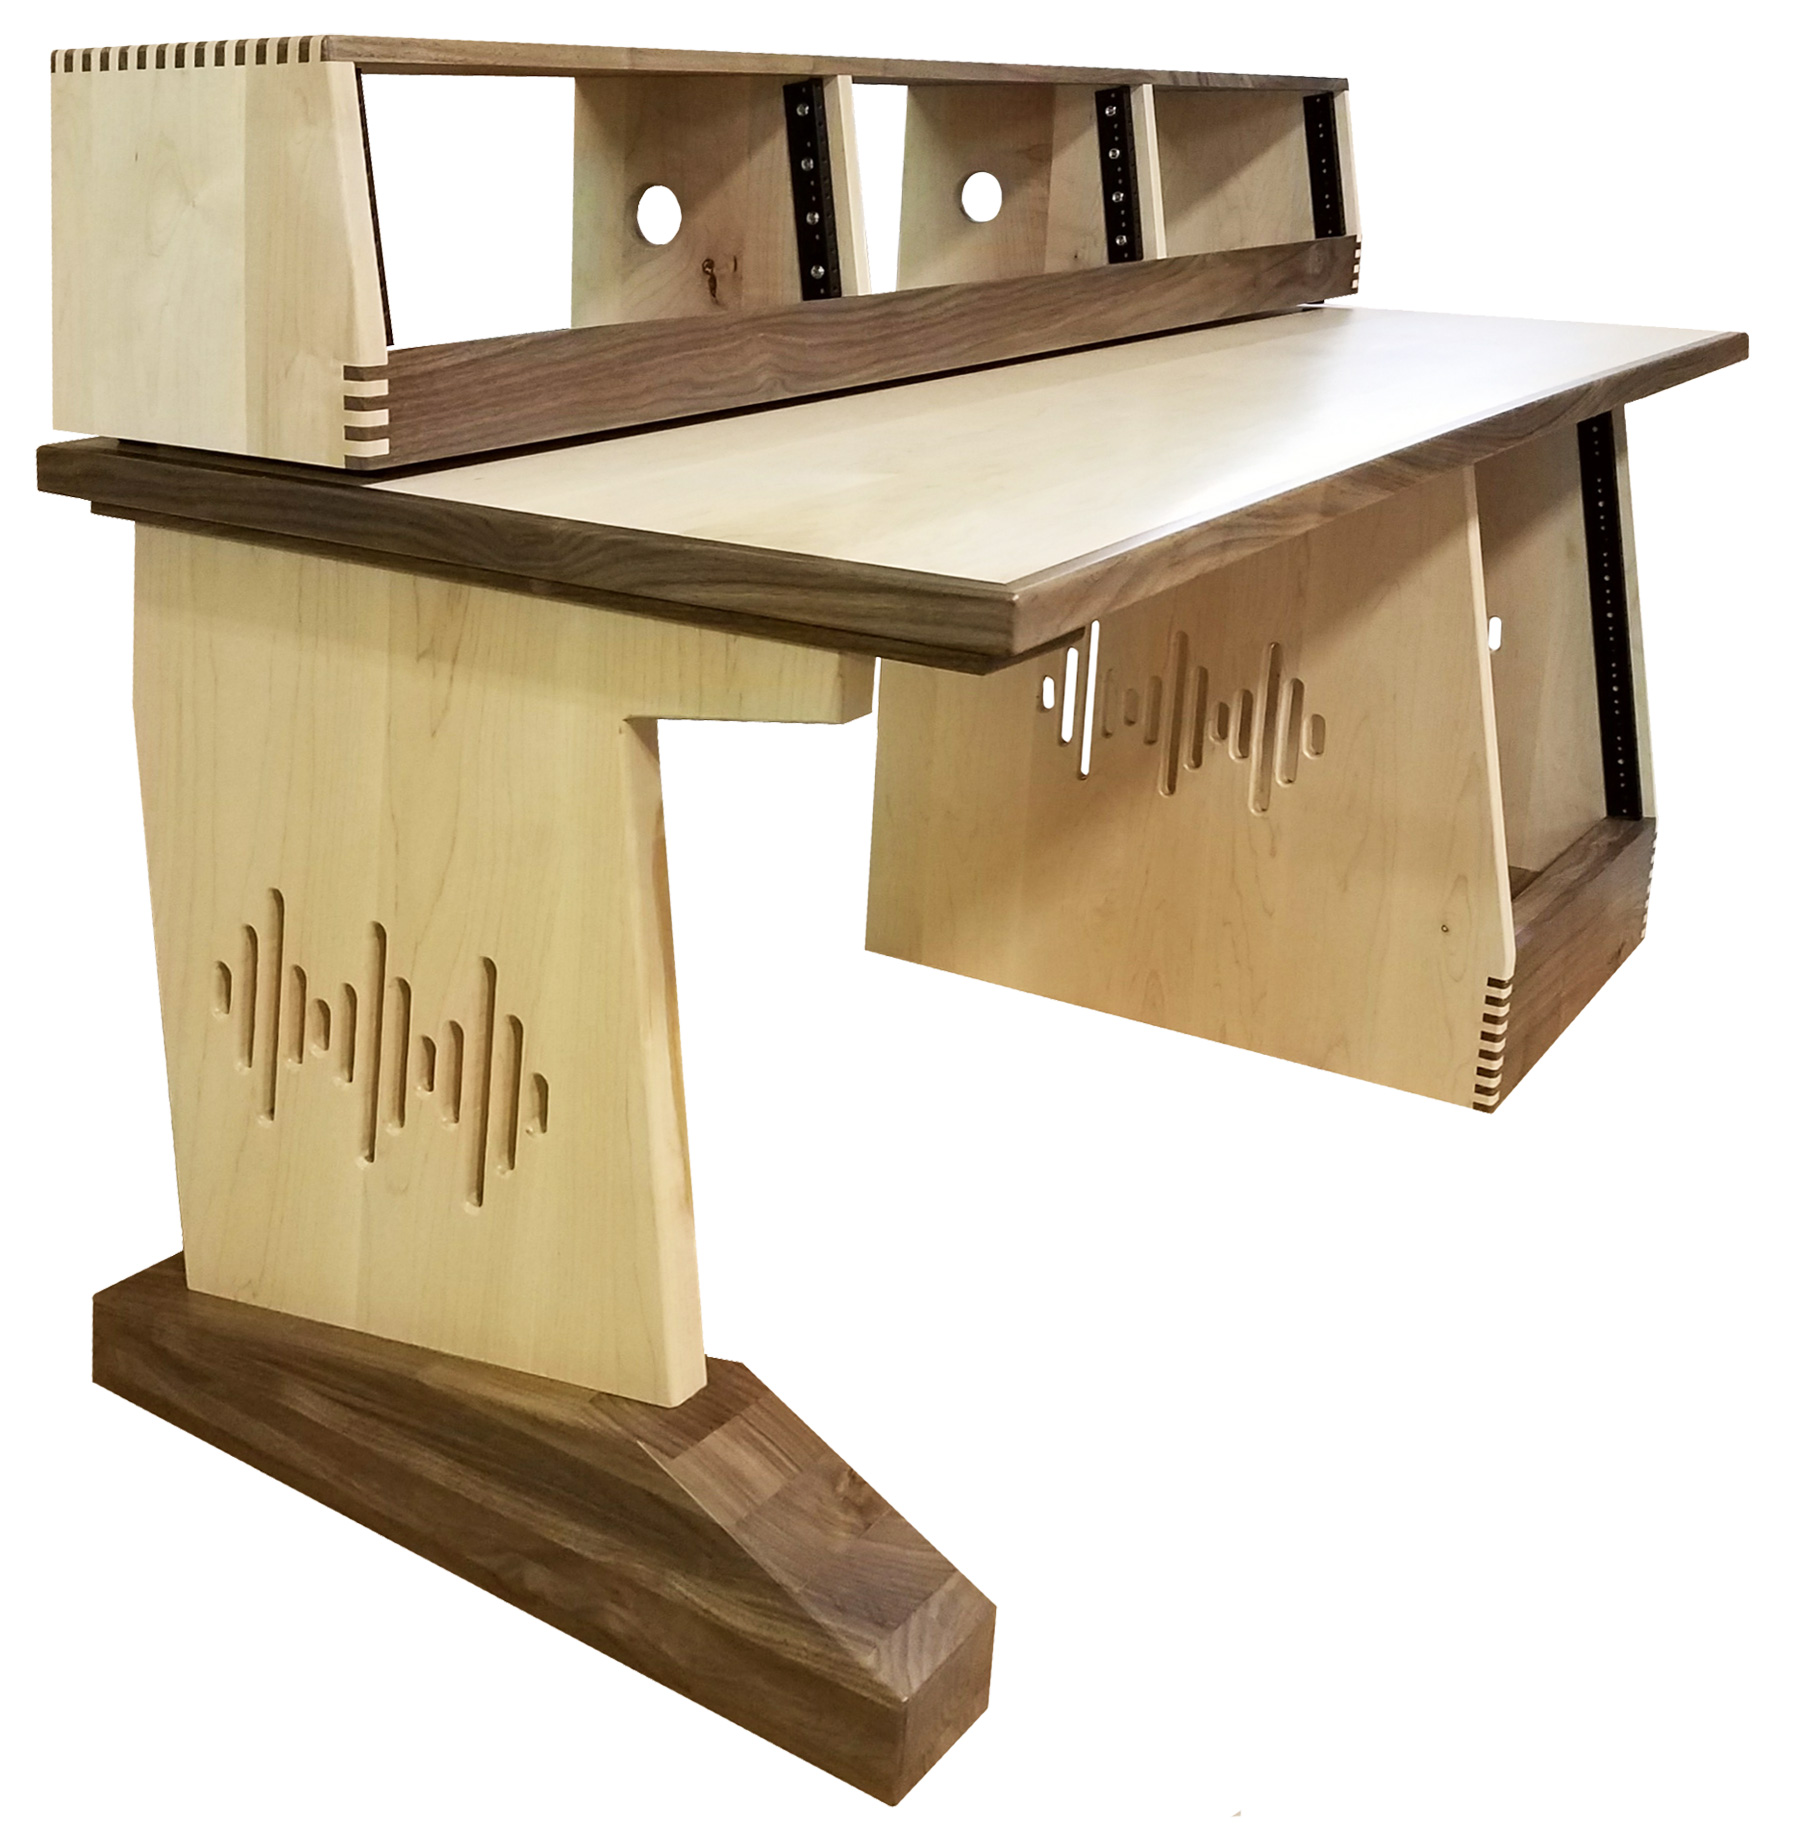 Home S Modular Studio Desks Pre Configured Desk Designs Audiorax Design E 30 Deep X 60 Wide Solid Maple And Walnut